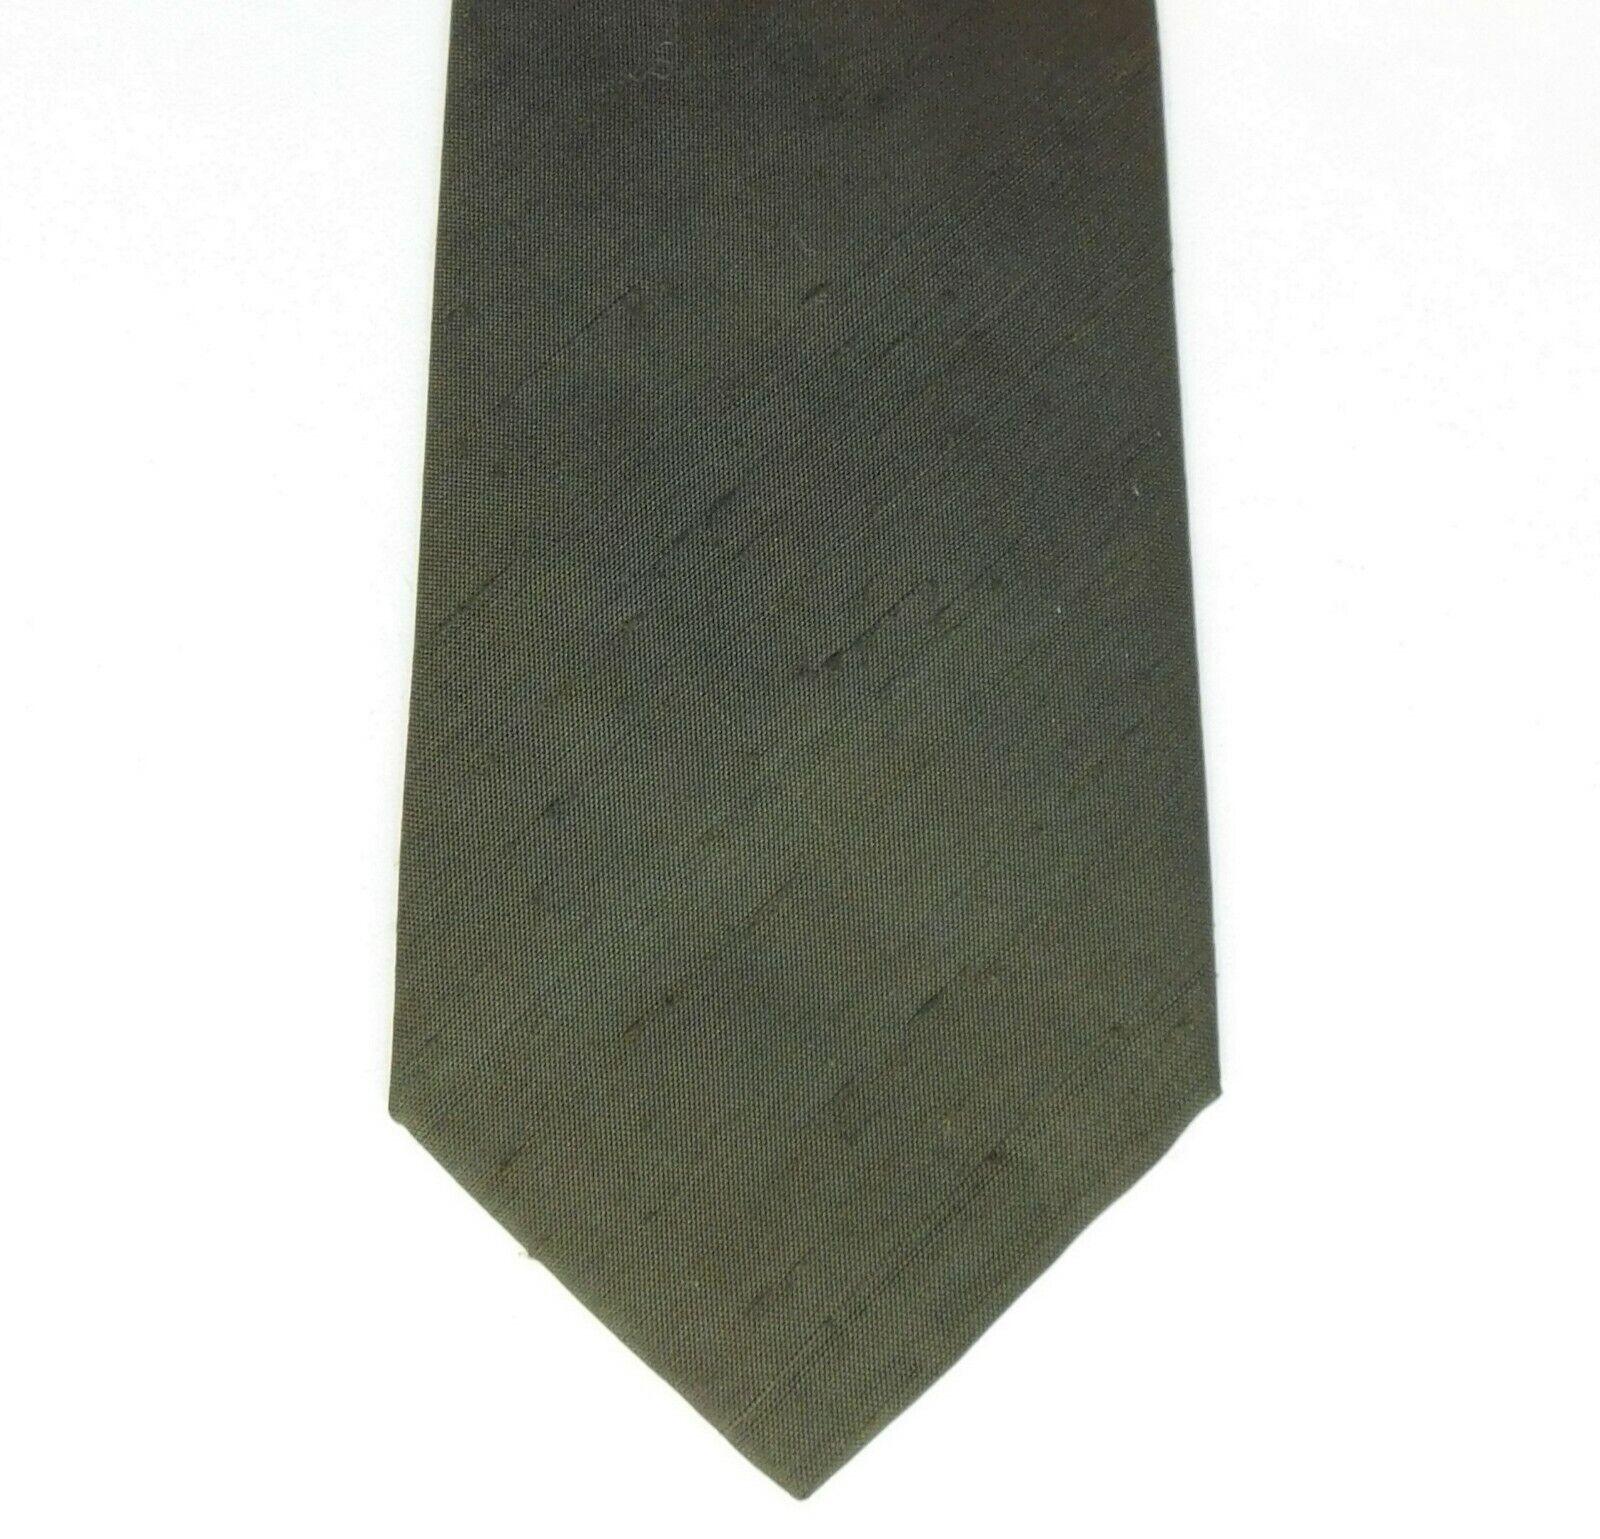 Green textured silk tie NEW made in Belgium Jose Piscador pure silk